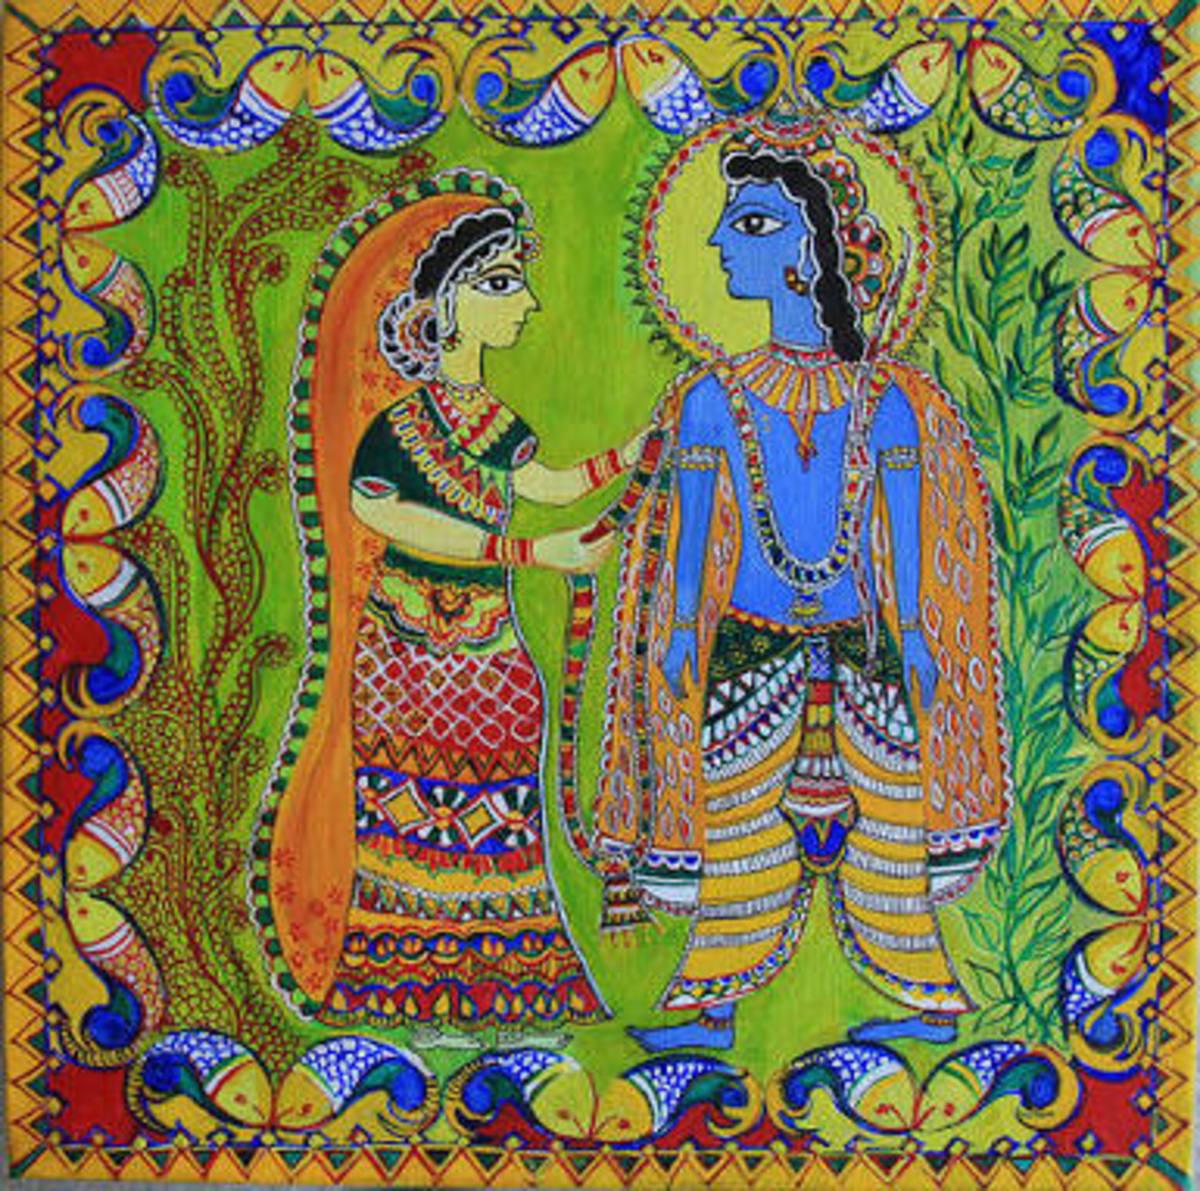 The Ram-Sita Wedding in Madhubani paintings